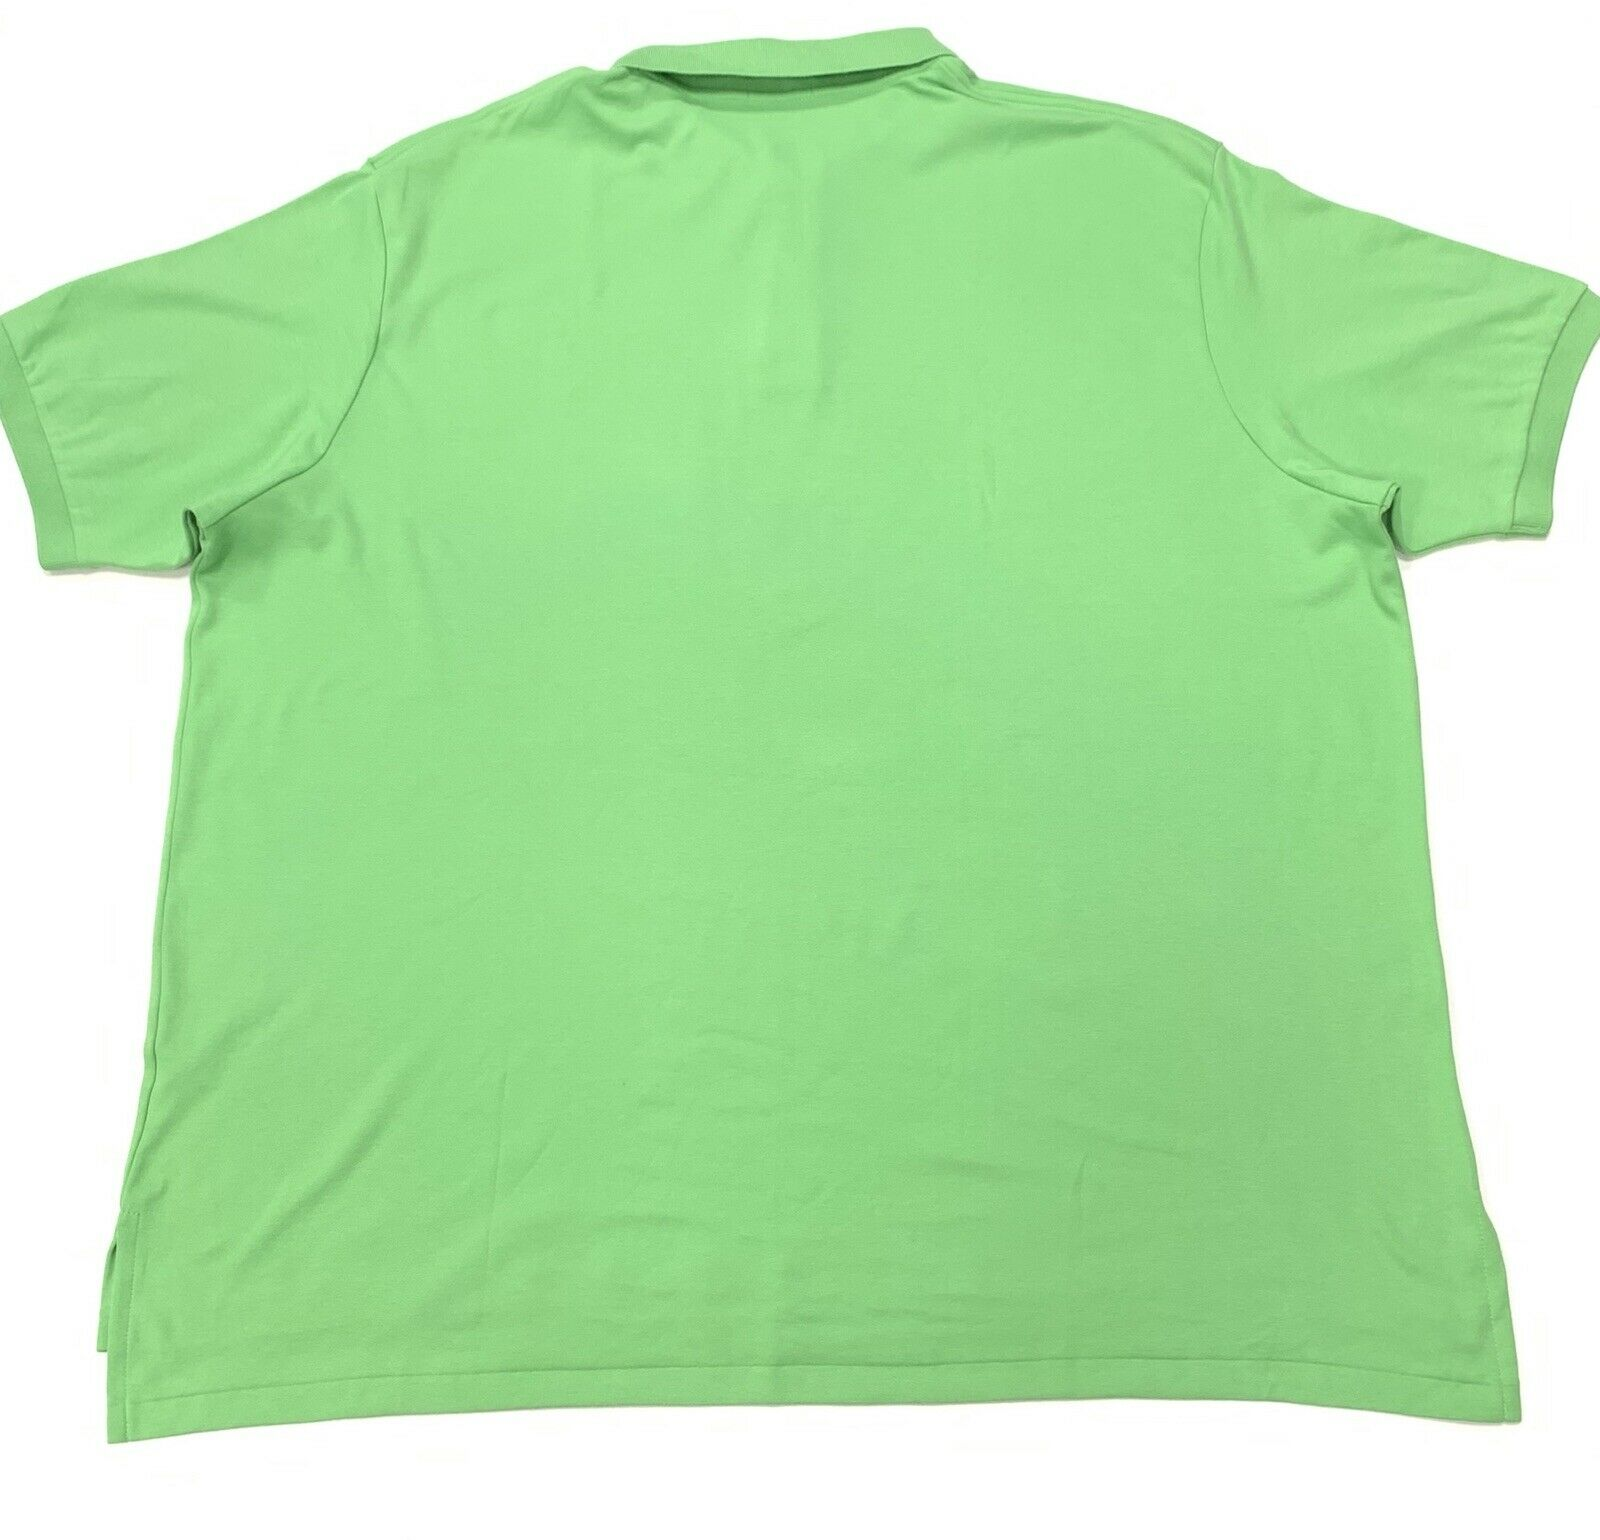 POLO RALPH LAUREN LAUREN LAUREN uomo CLASSIC FIT COTONE PIMA T-Shirt in verde Taglia 4XB-BIG 24f5f0